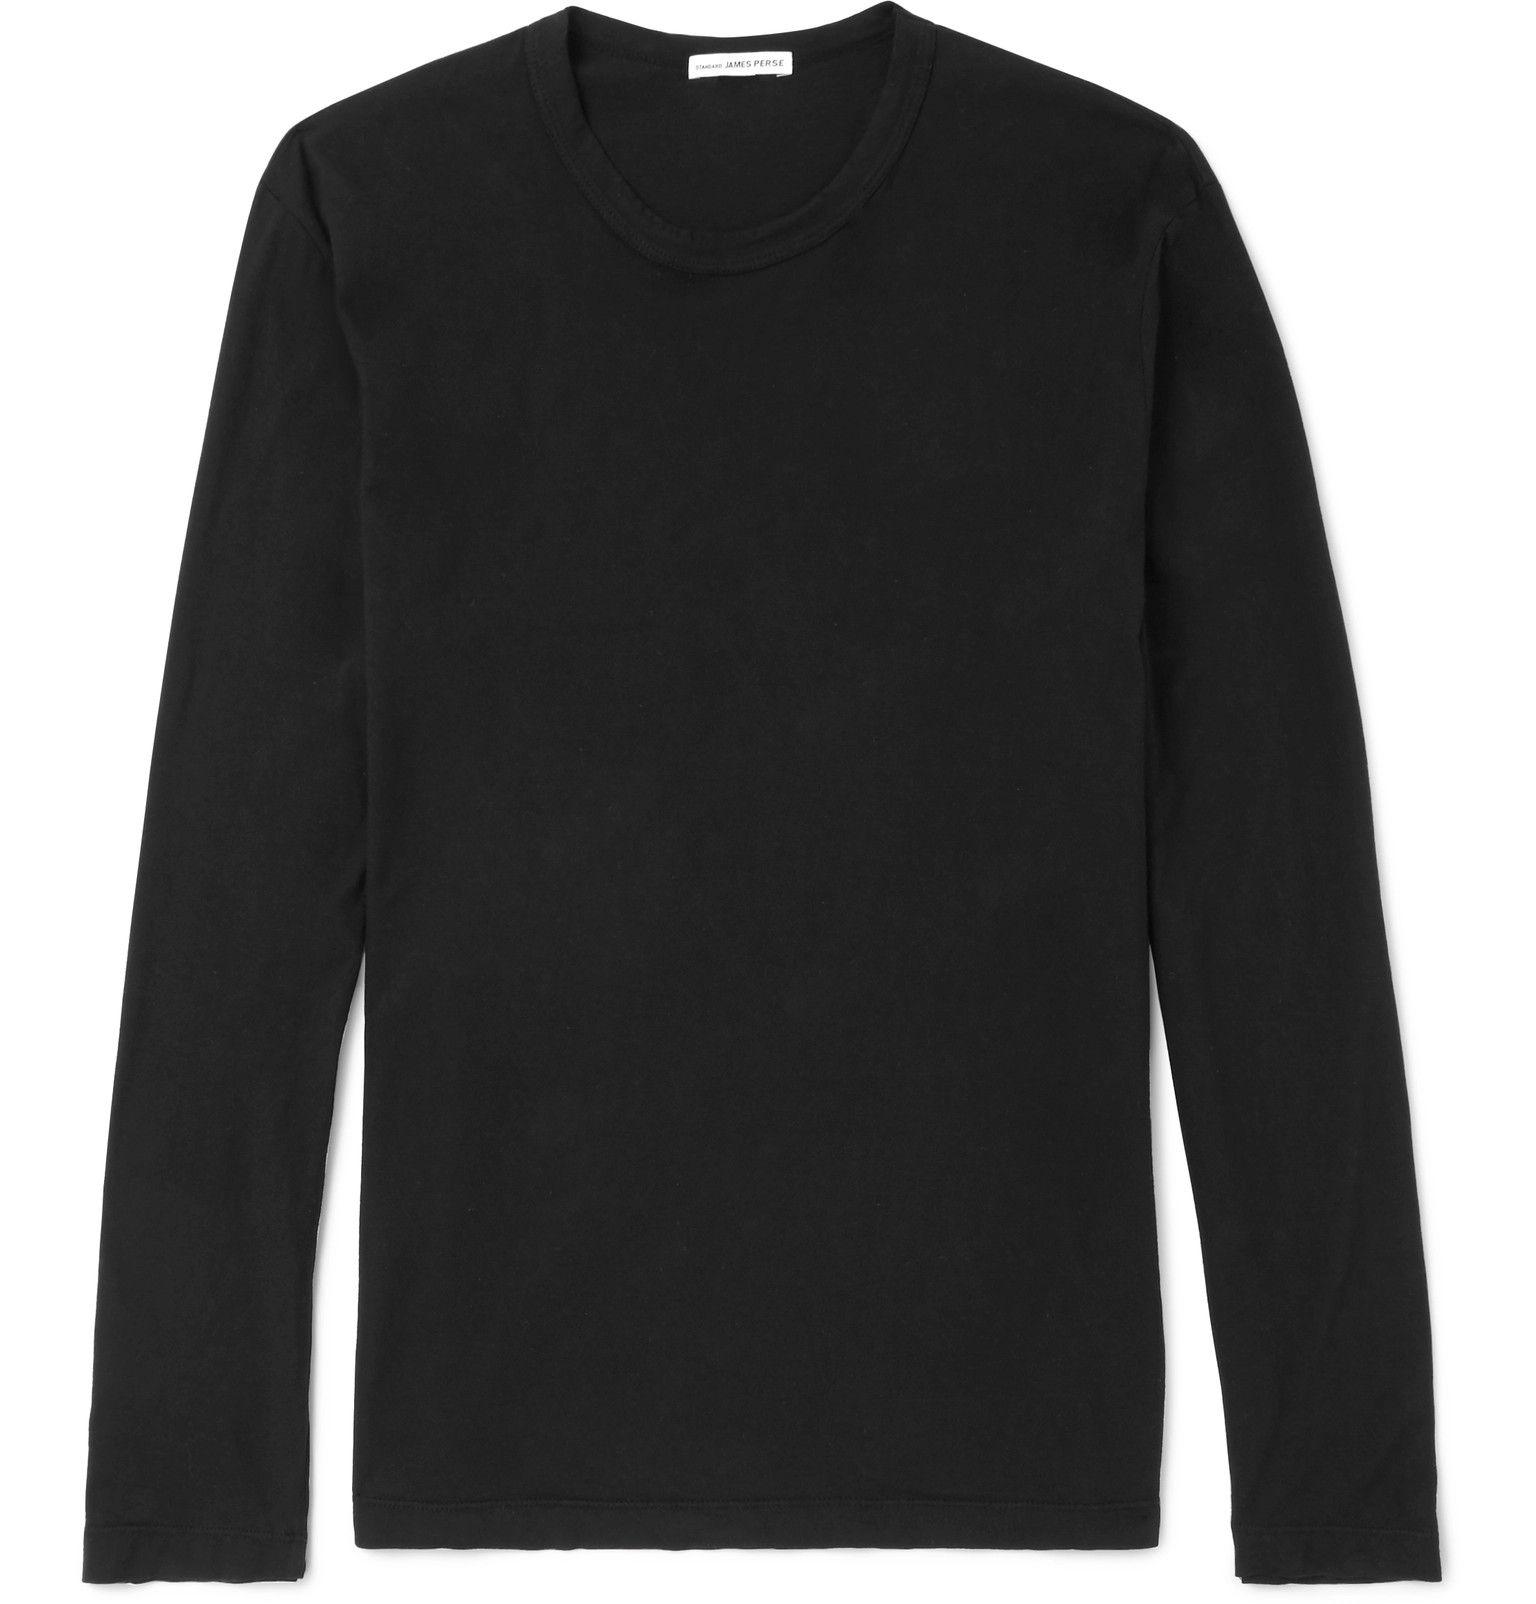 James Perse Mens Vintage Fleece Sweatshirt in Black 4